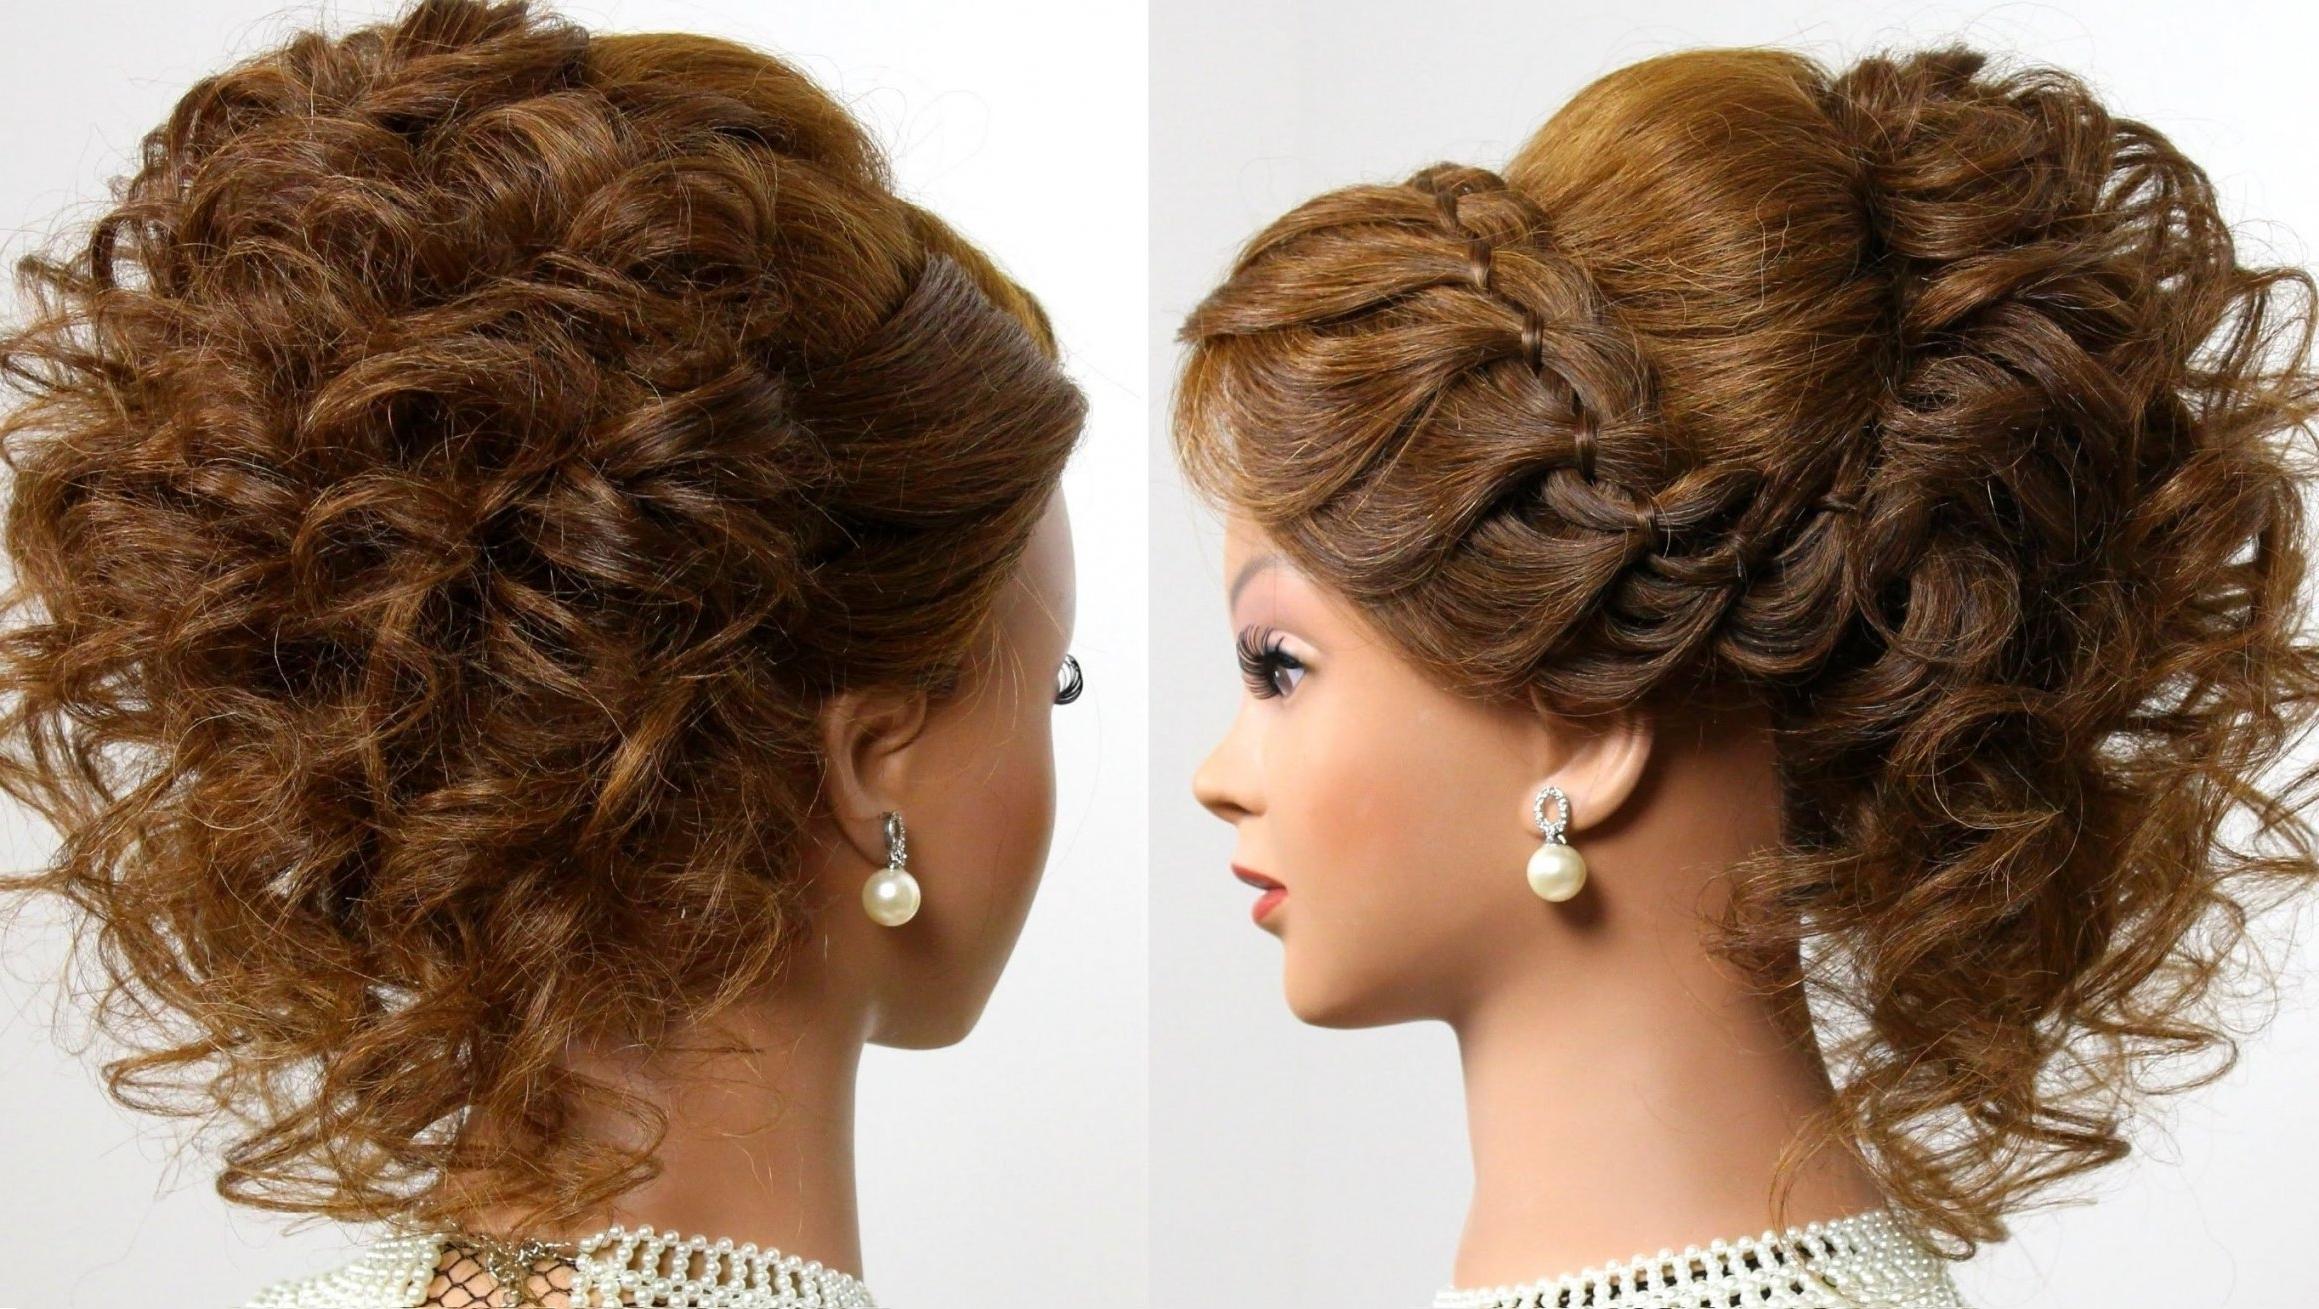 Updos For Medium Hair Prom Medium Hair Updo Hairstyles For Prom Inside Updo Hairstyles For Medium Hair (View 10 of 15)